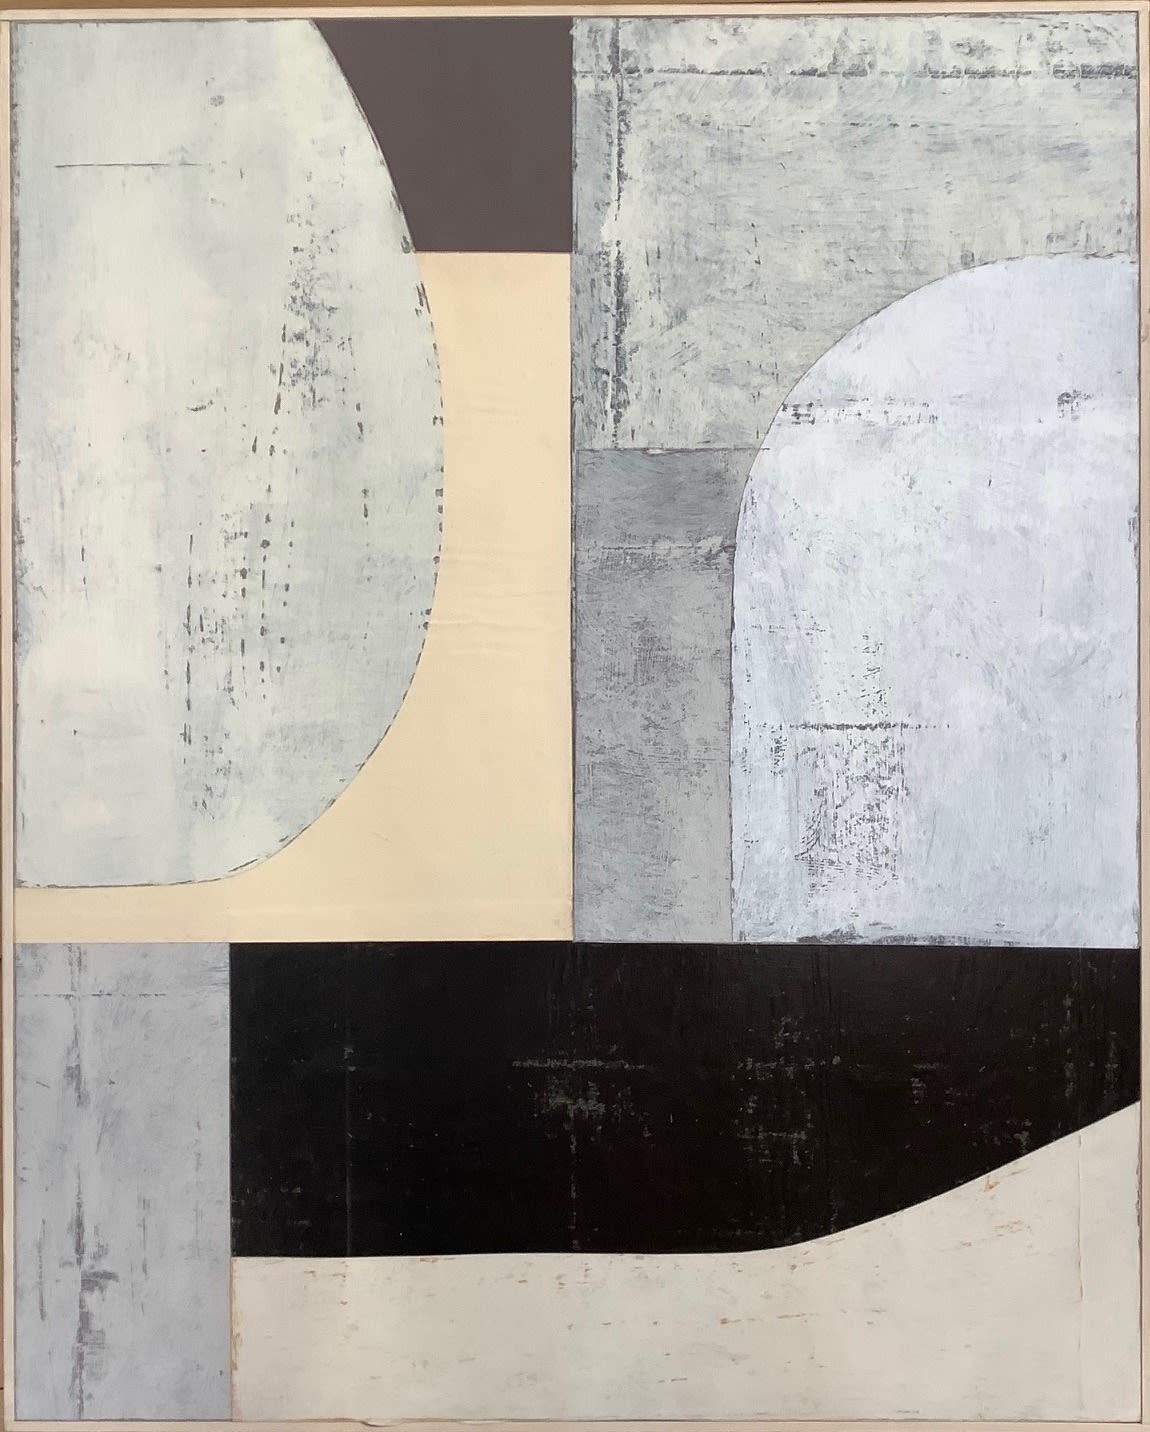 Daniel Anselmi, Untitled (4-10), 2018